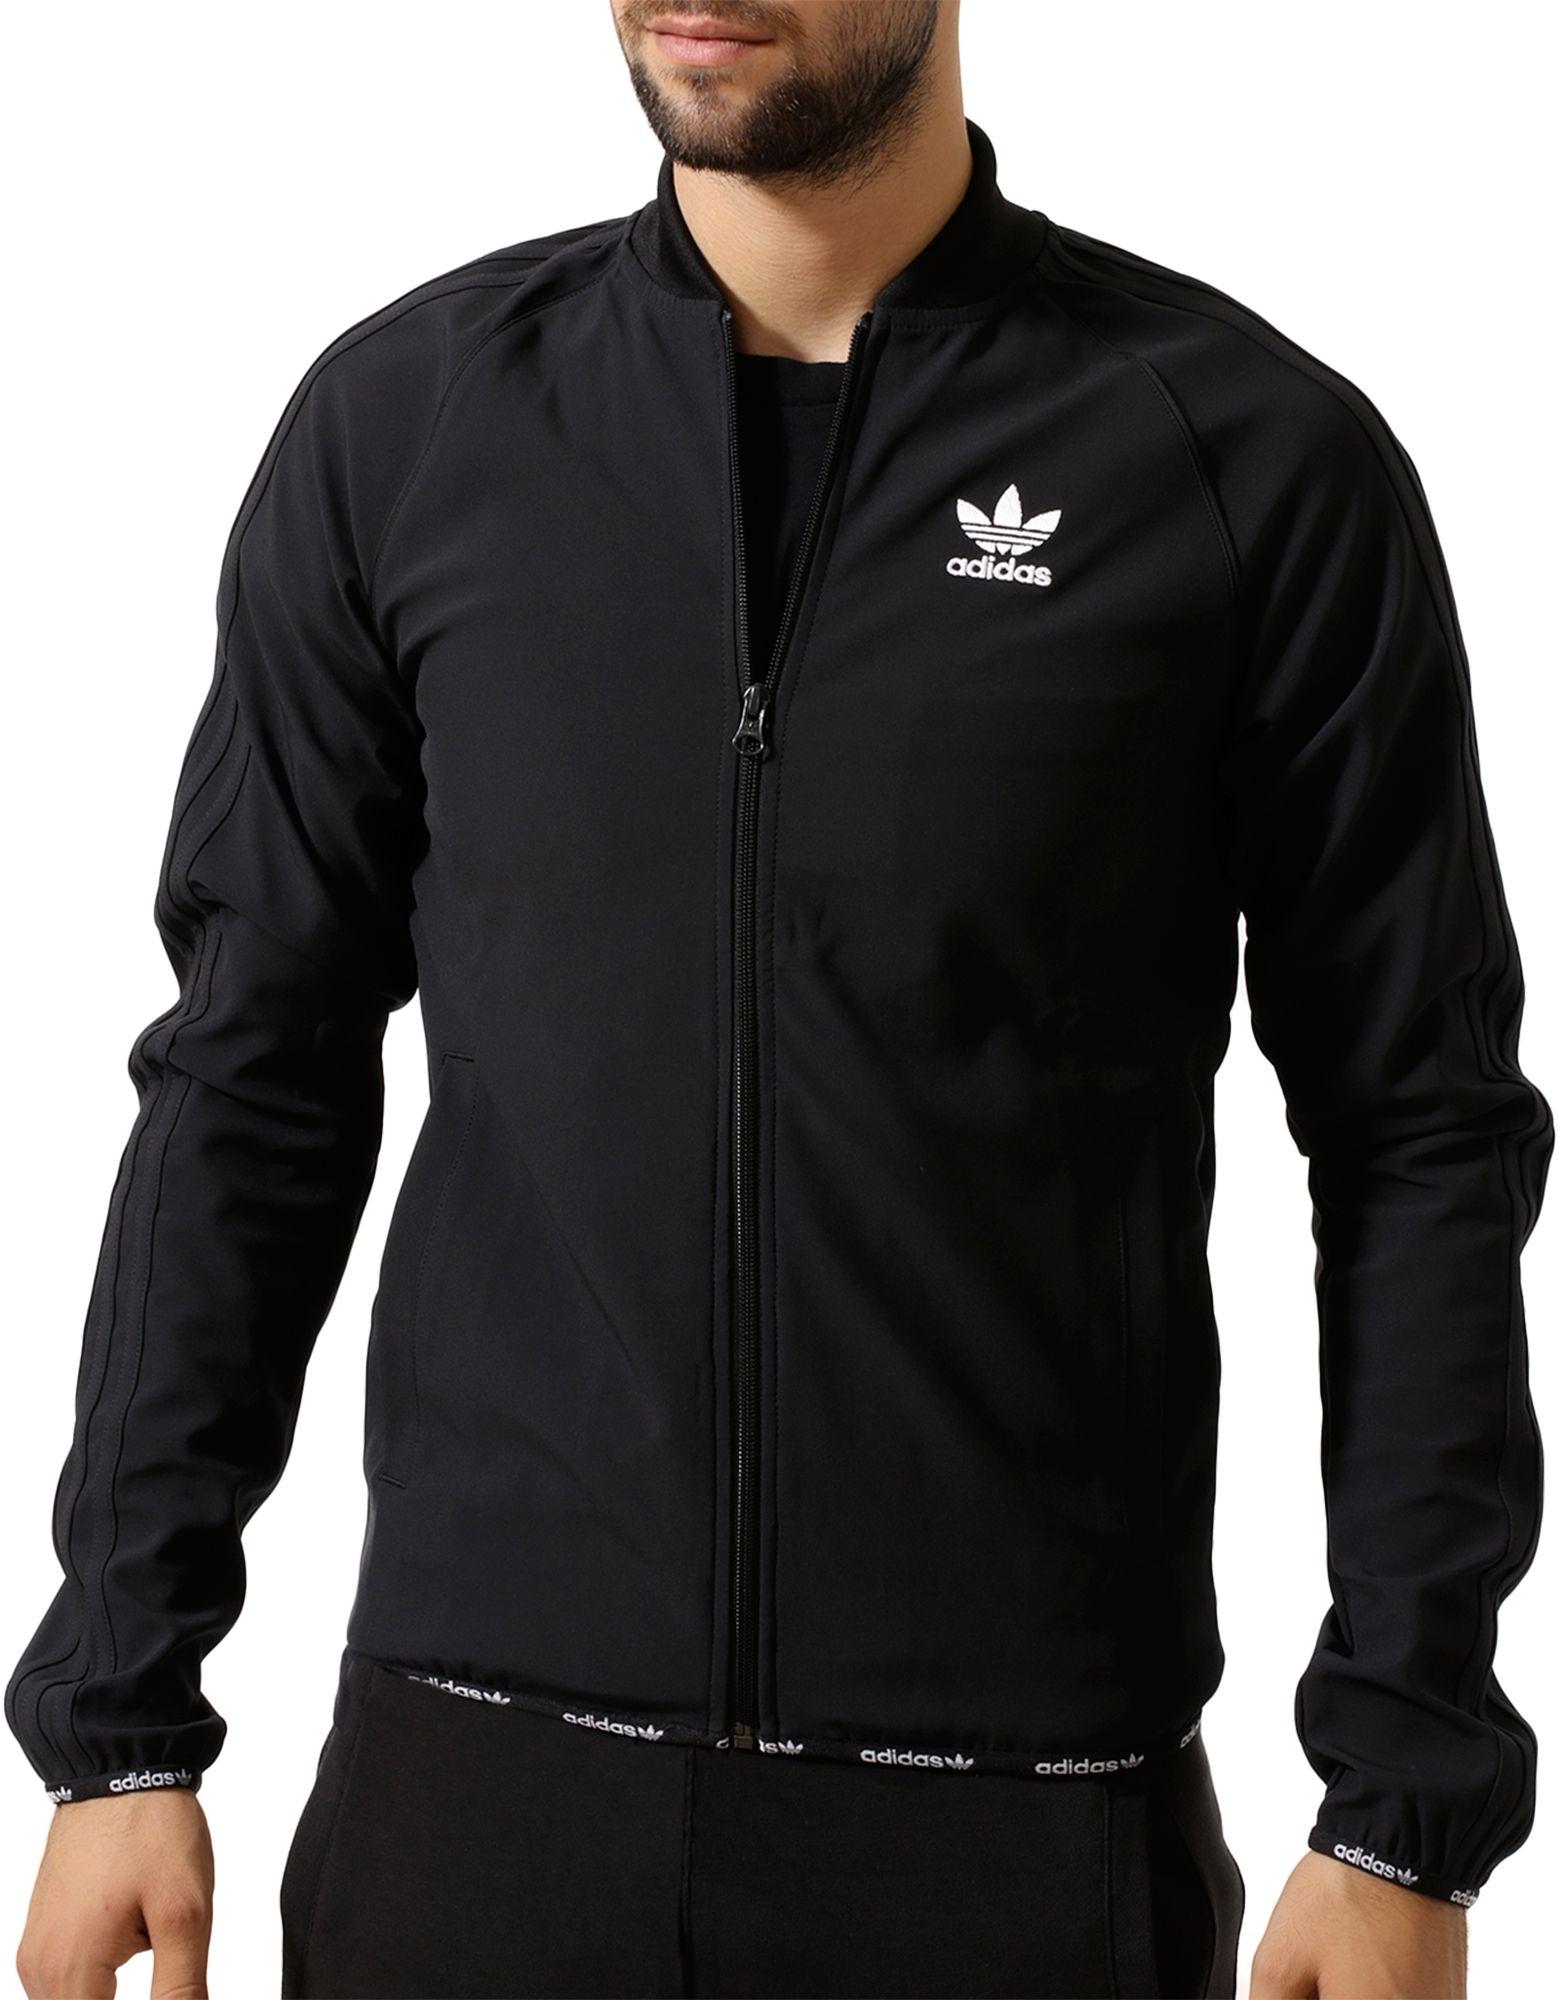 Adidas jacket - Noimagefound